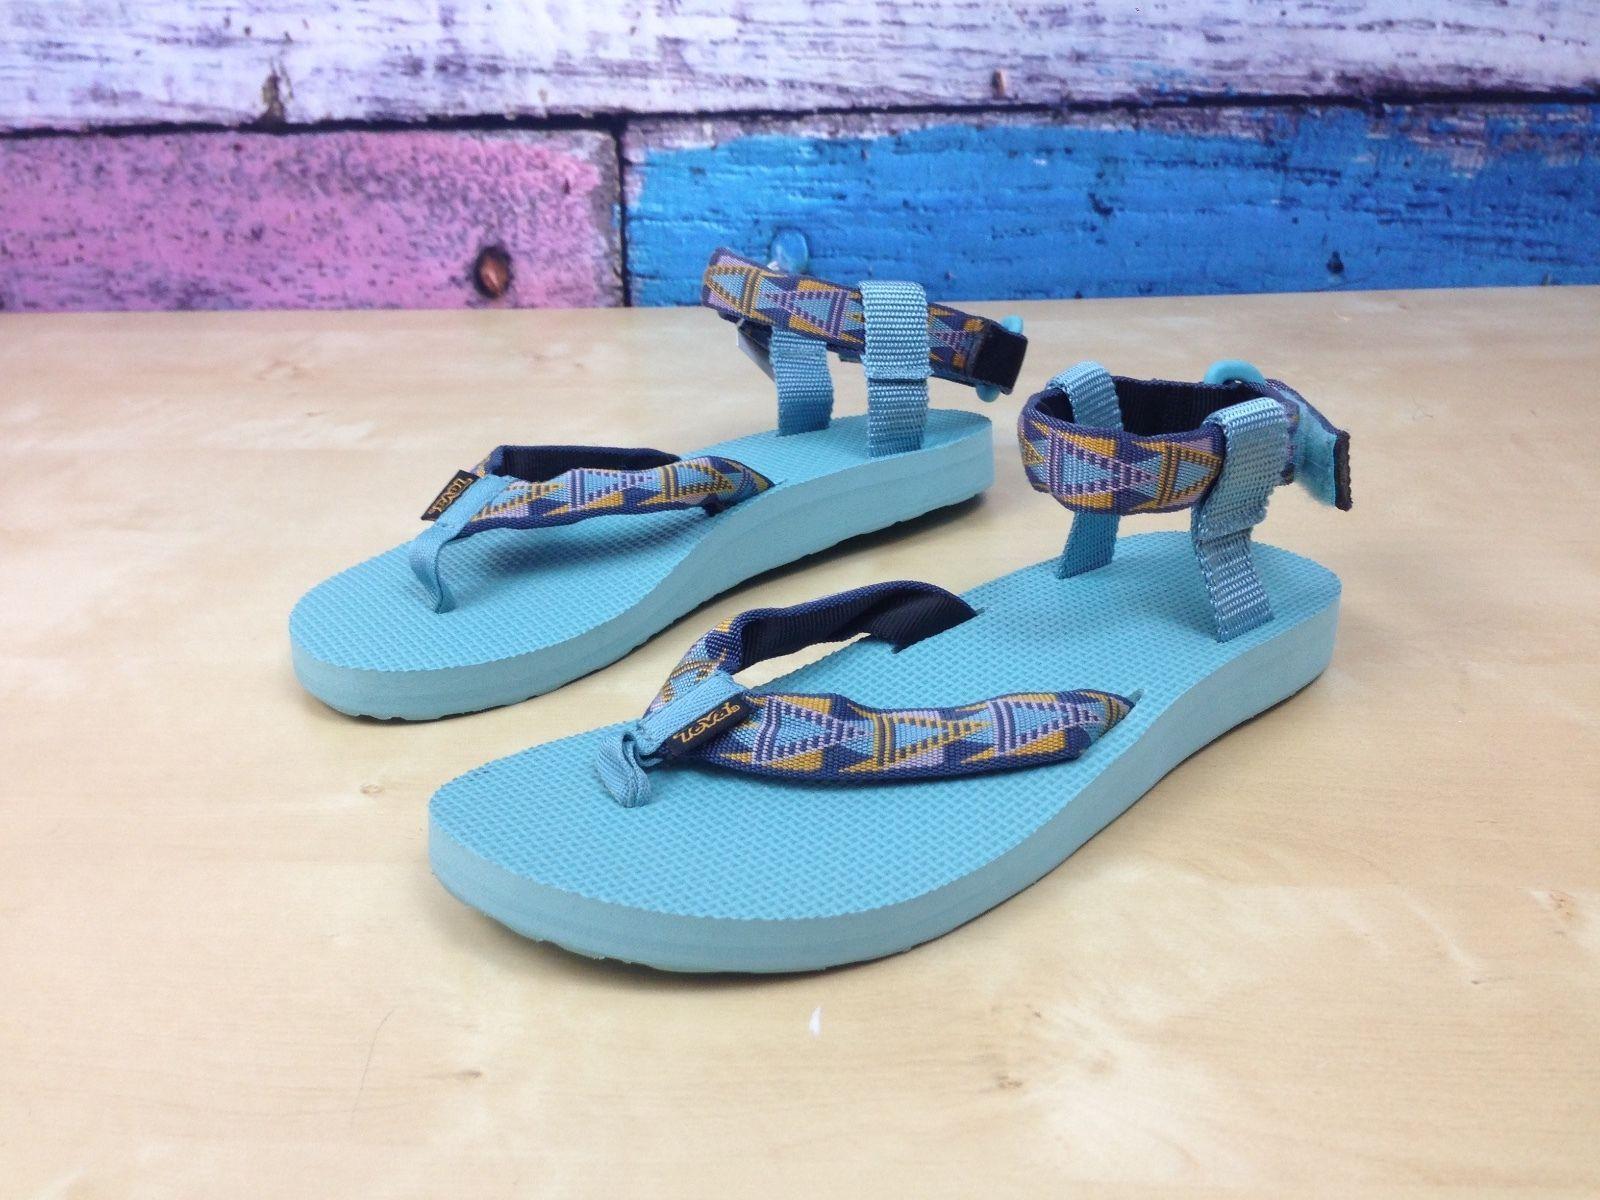 Teva Artist Series Universal Sandal Blue Multi-color Straps Women's Size 10